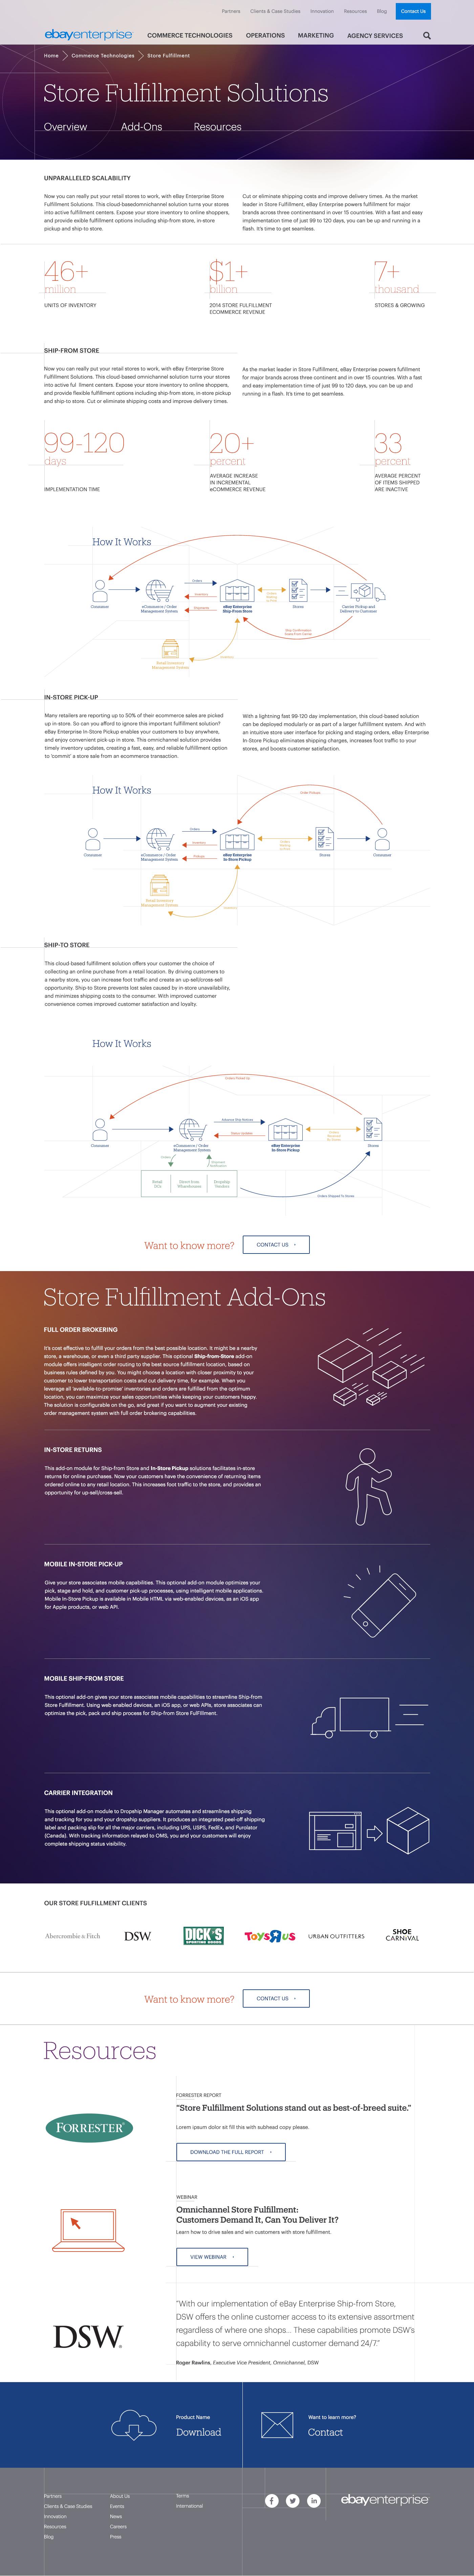 EE_store_fulfillment_r11_MK.jpg